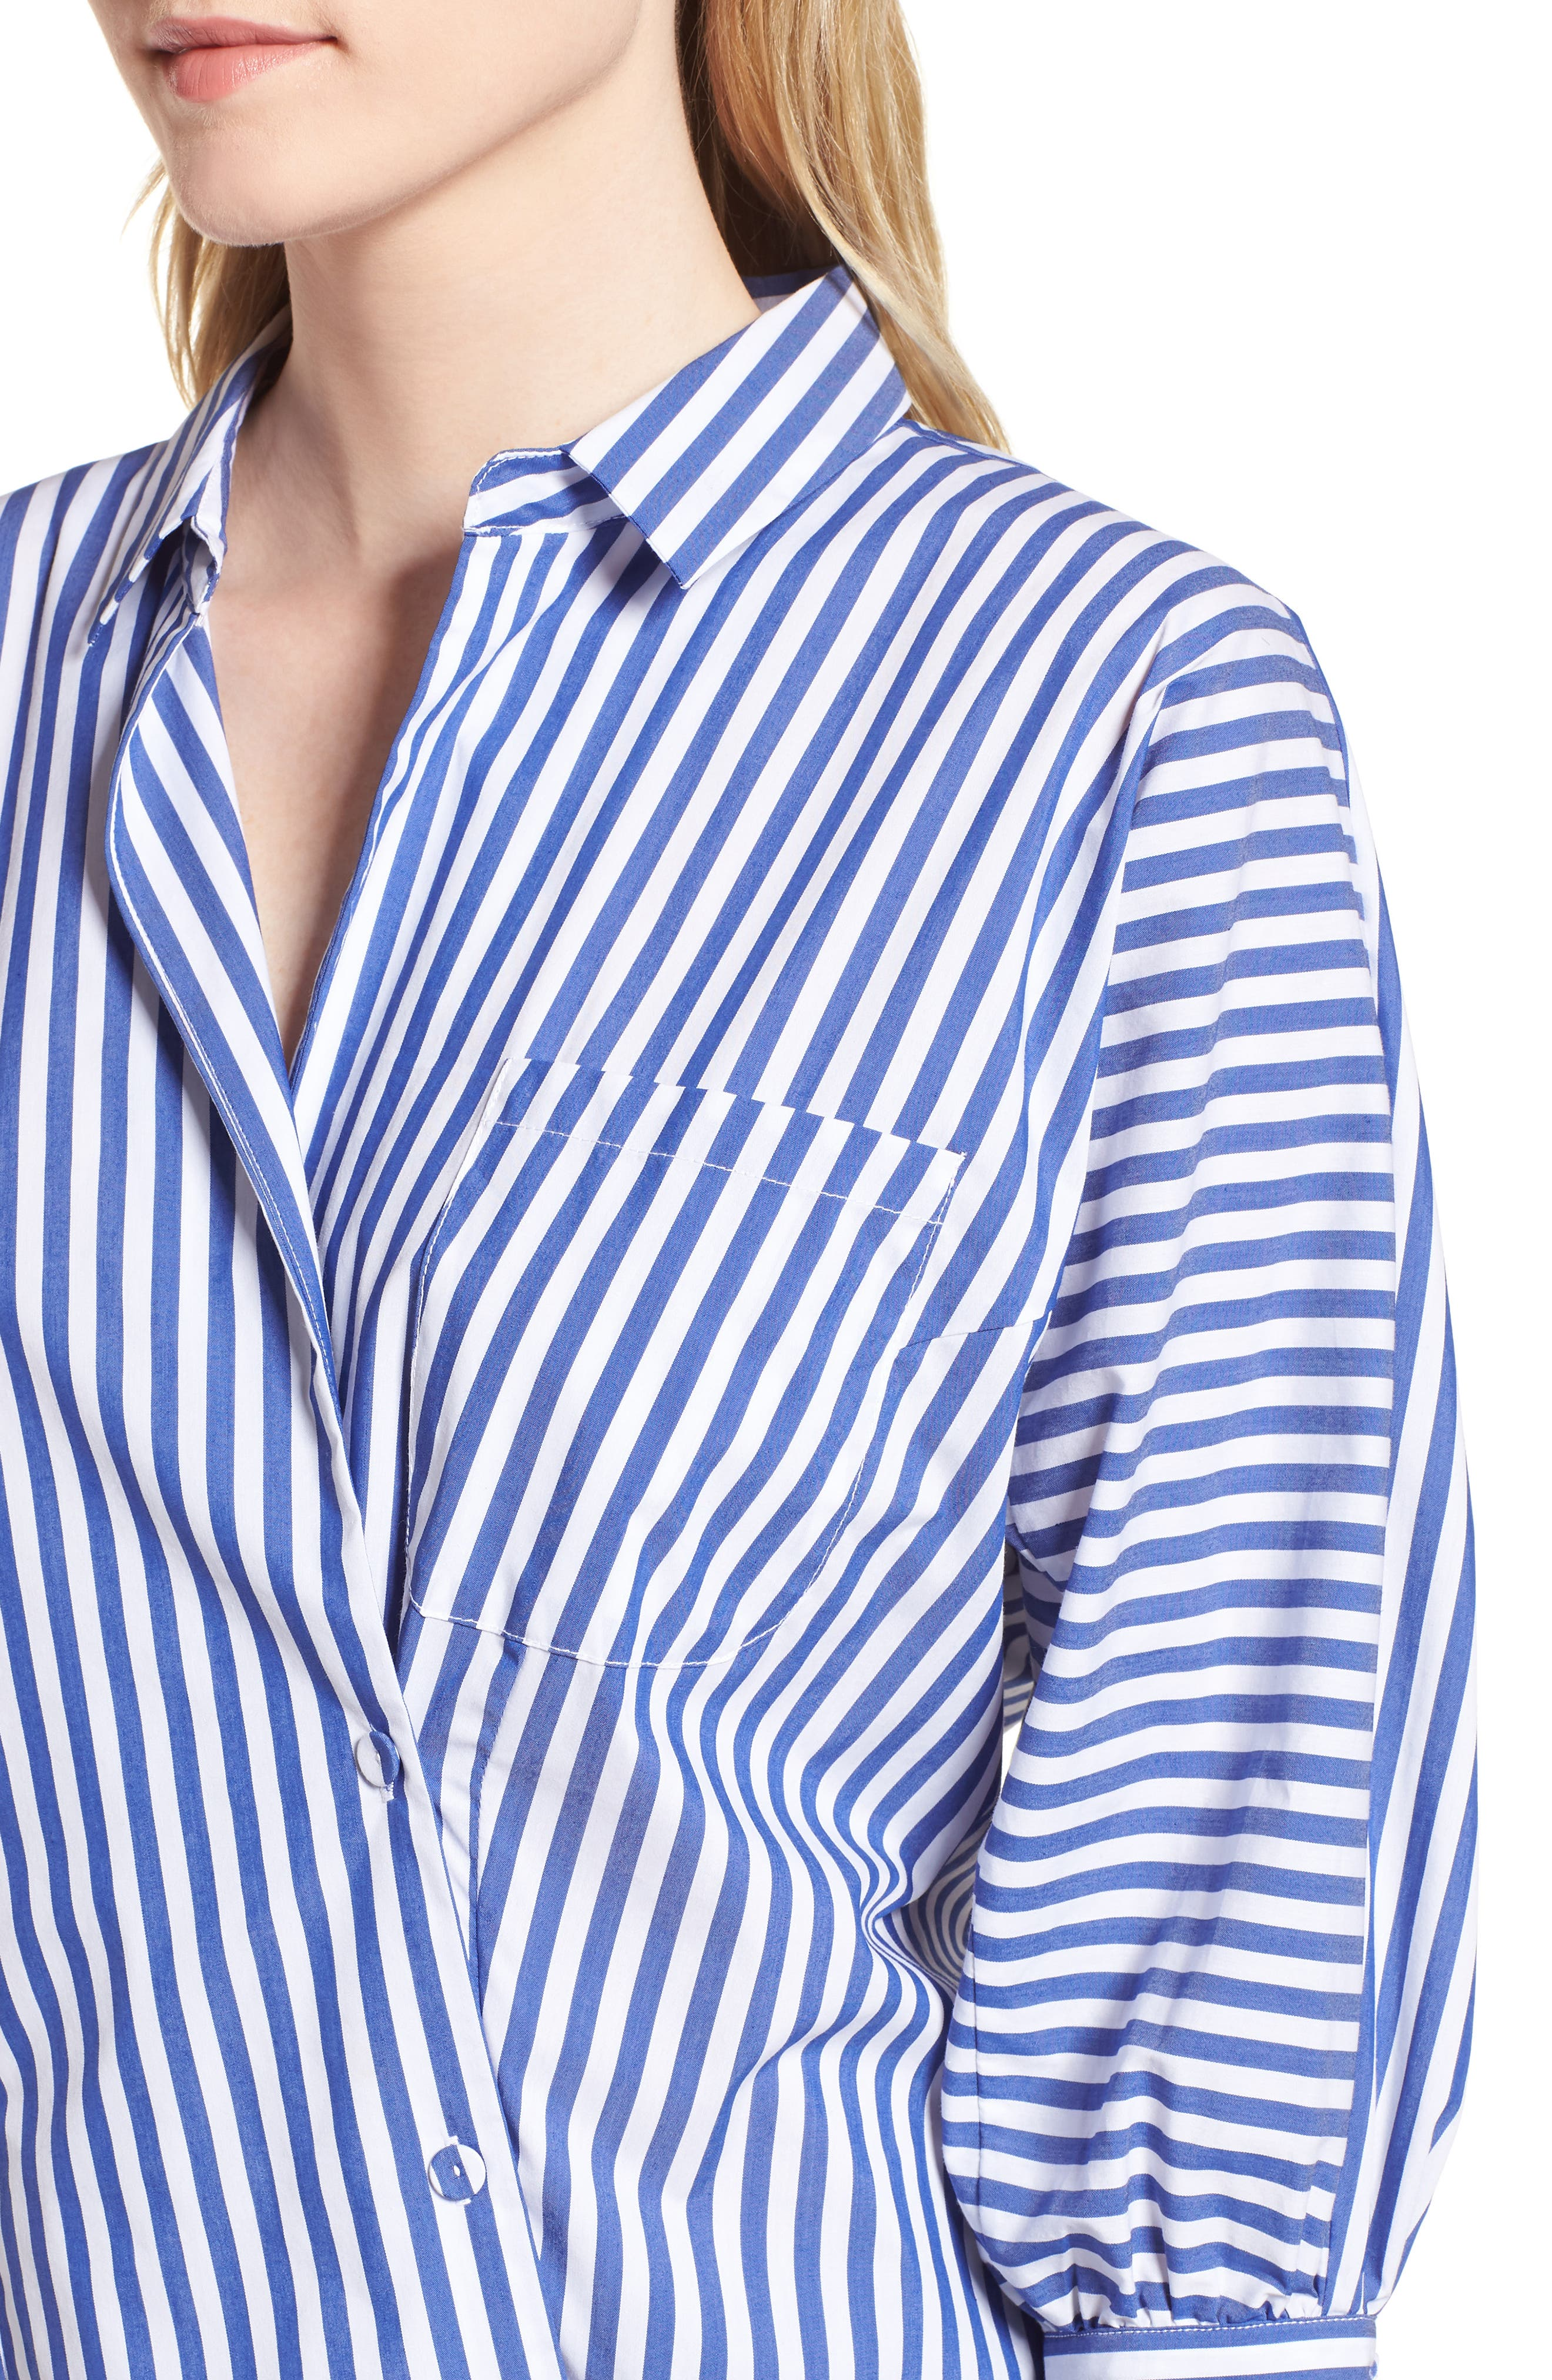 Asymmetrical Stripe Blouse,                             Alternate thumbnail 4, color,                             Abby Blue/ White